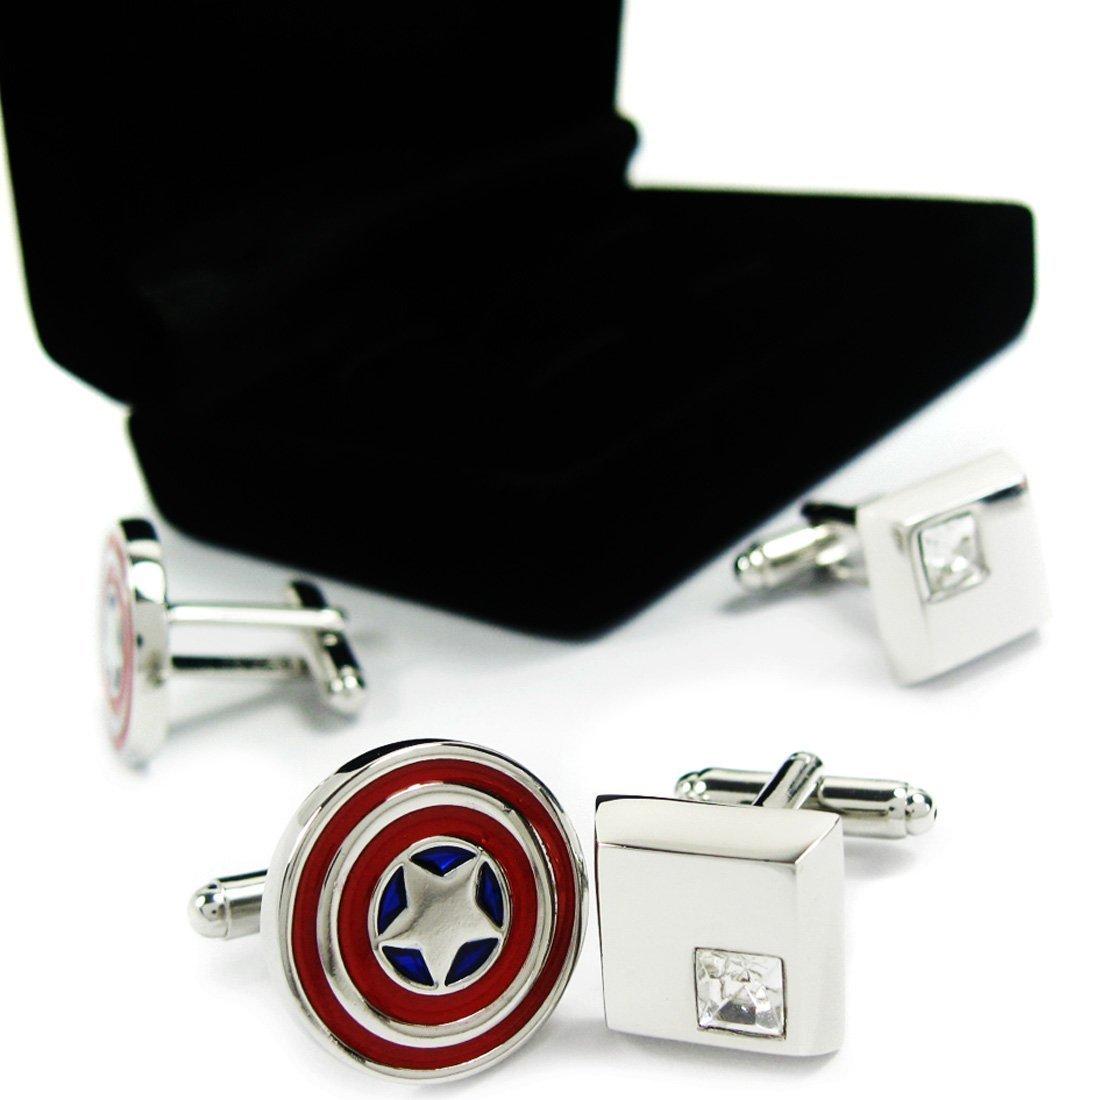 kilofly Cufflinks Combo [Set of 2 pairs] - Captain America, with Velvet Gift Box